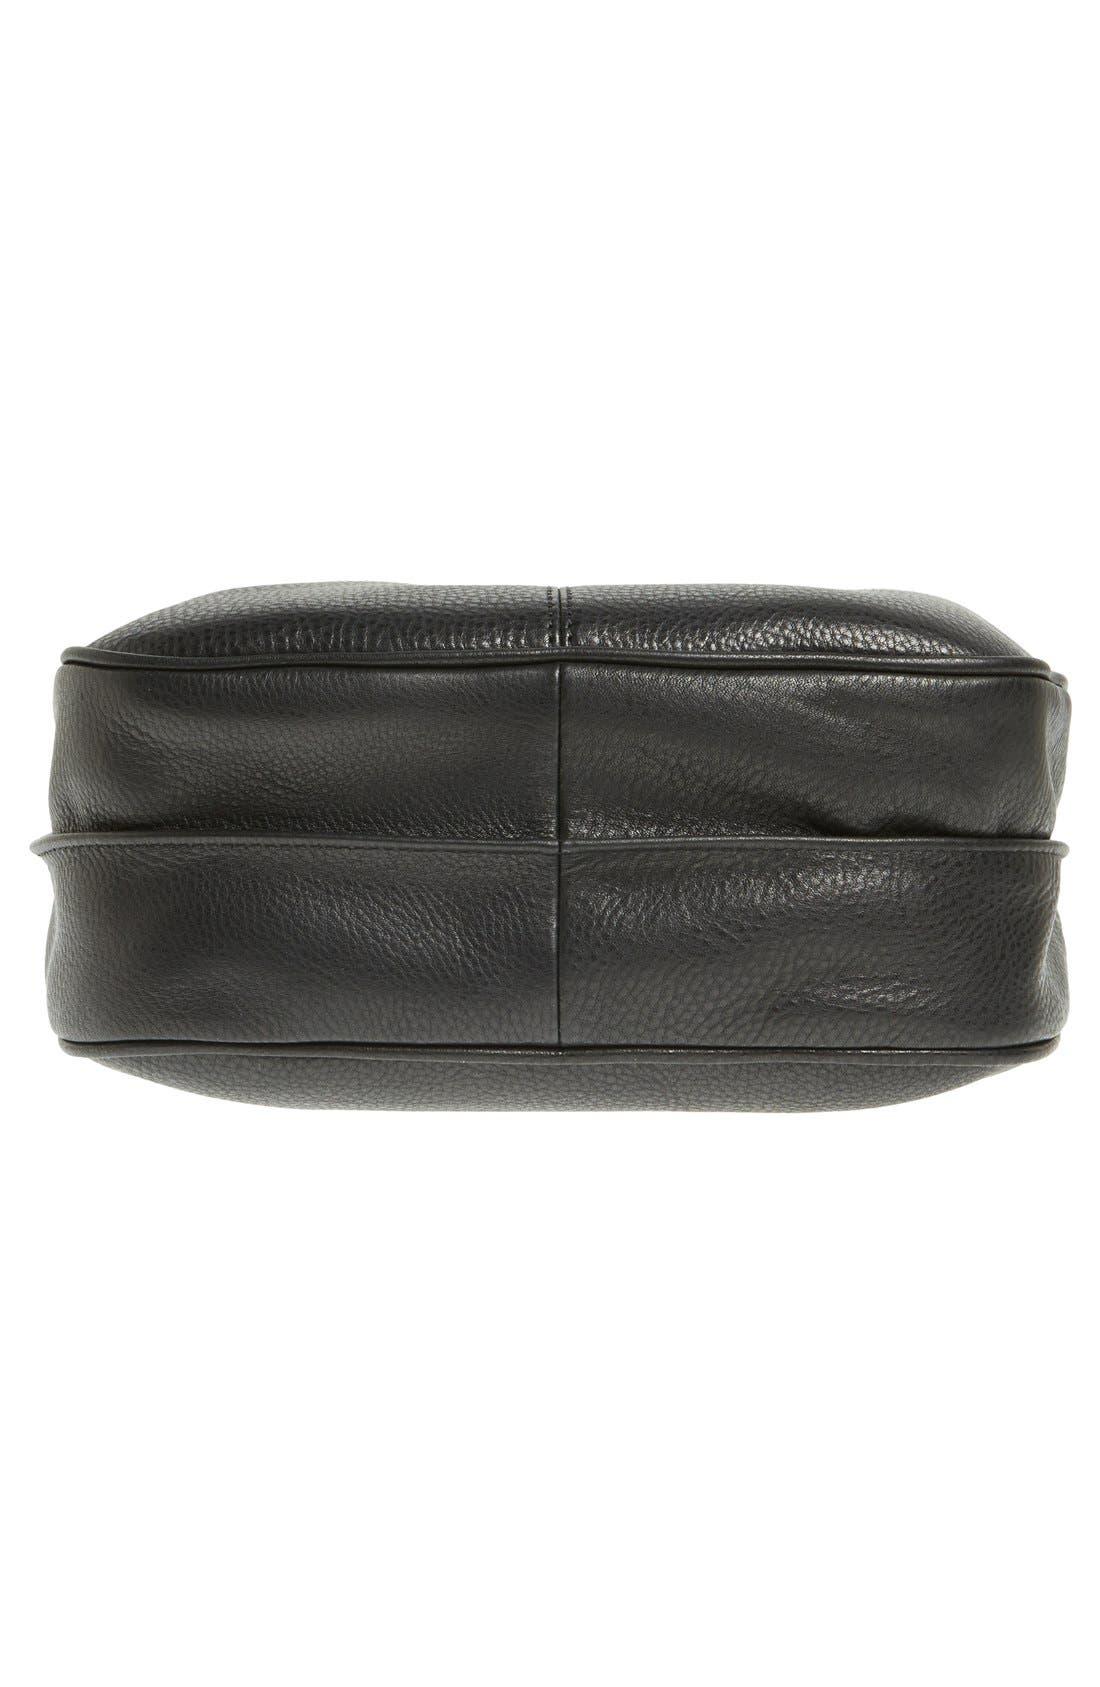 'Mystery' Leather Hobo,                             Alternate thumbnail 6, color,                             Black